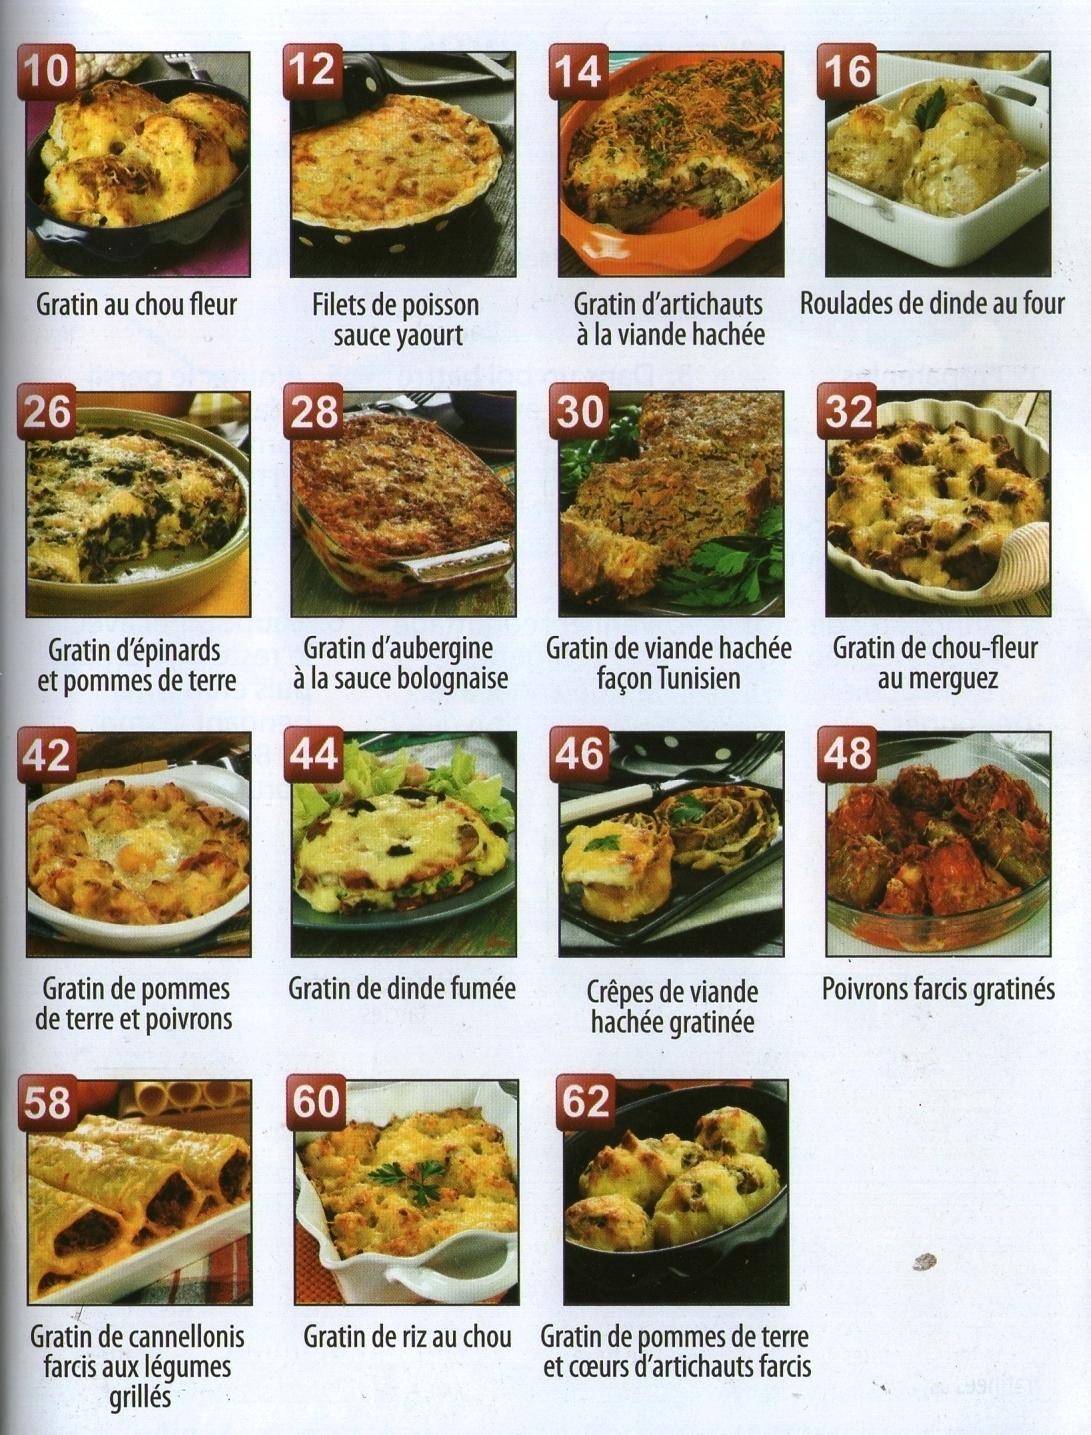 la cuisine alg 233 rienne gratins samira 2 fr